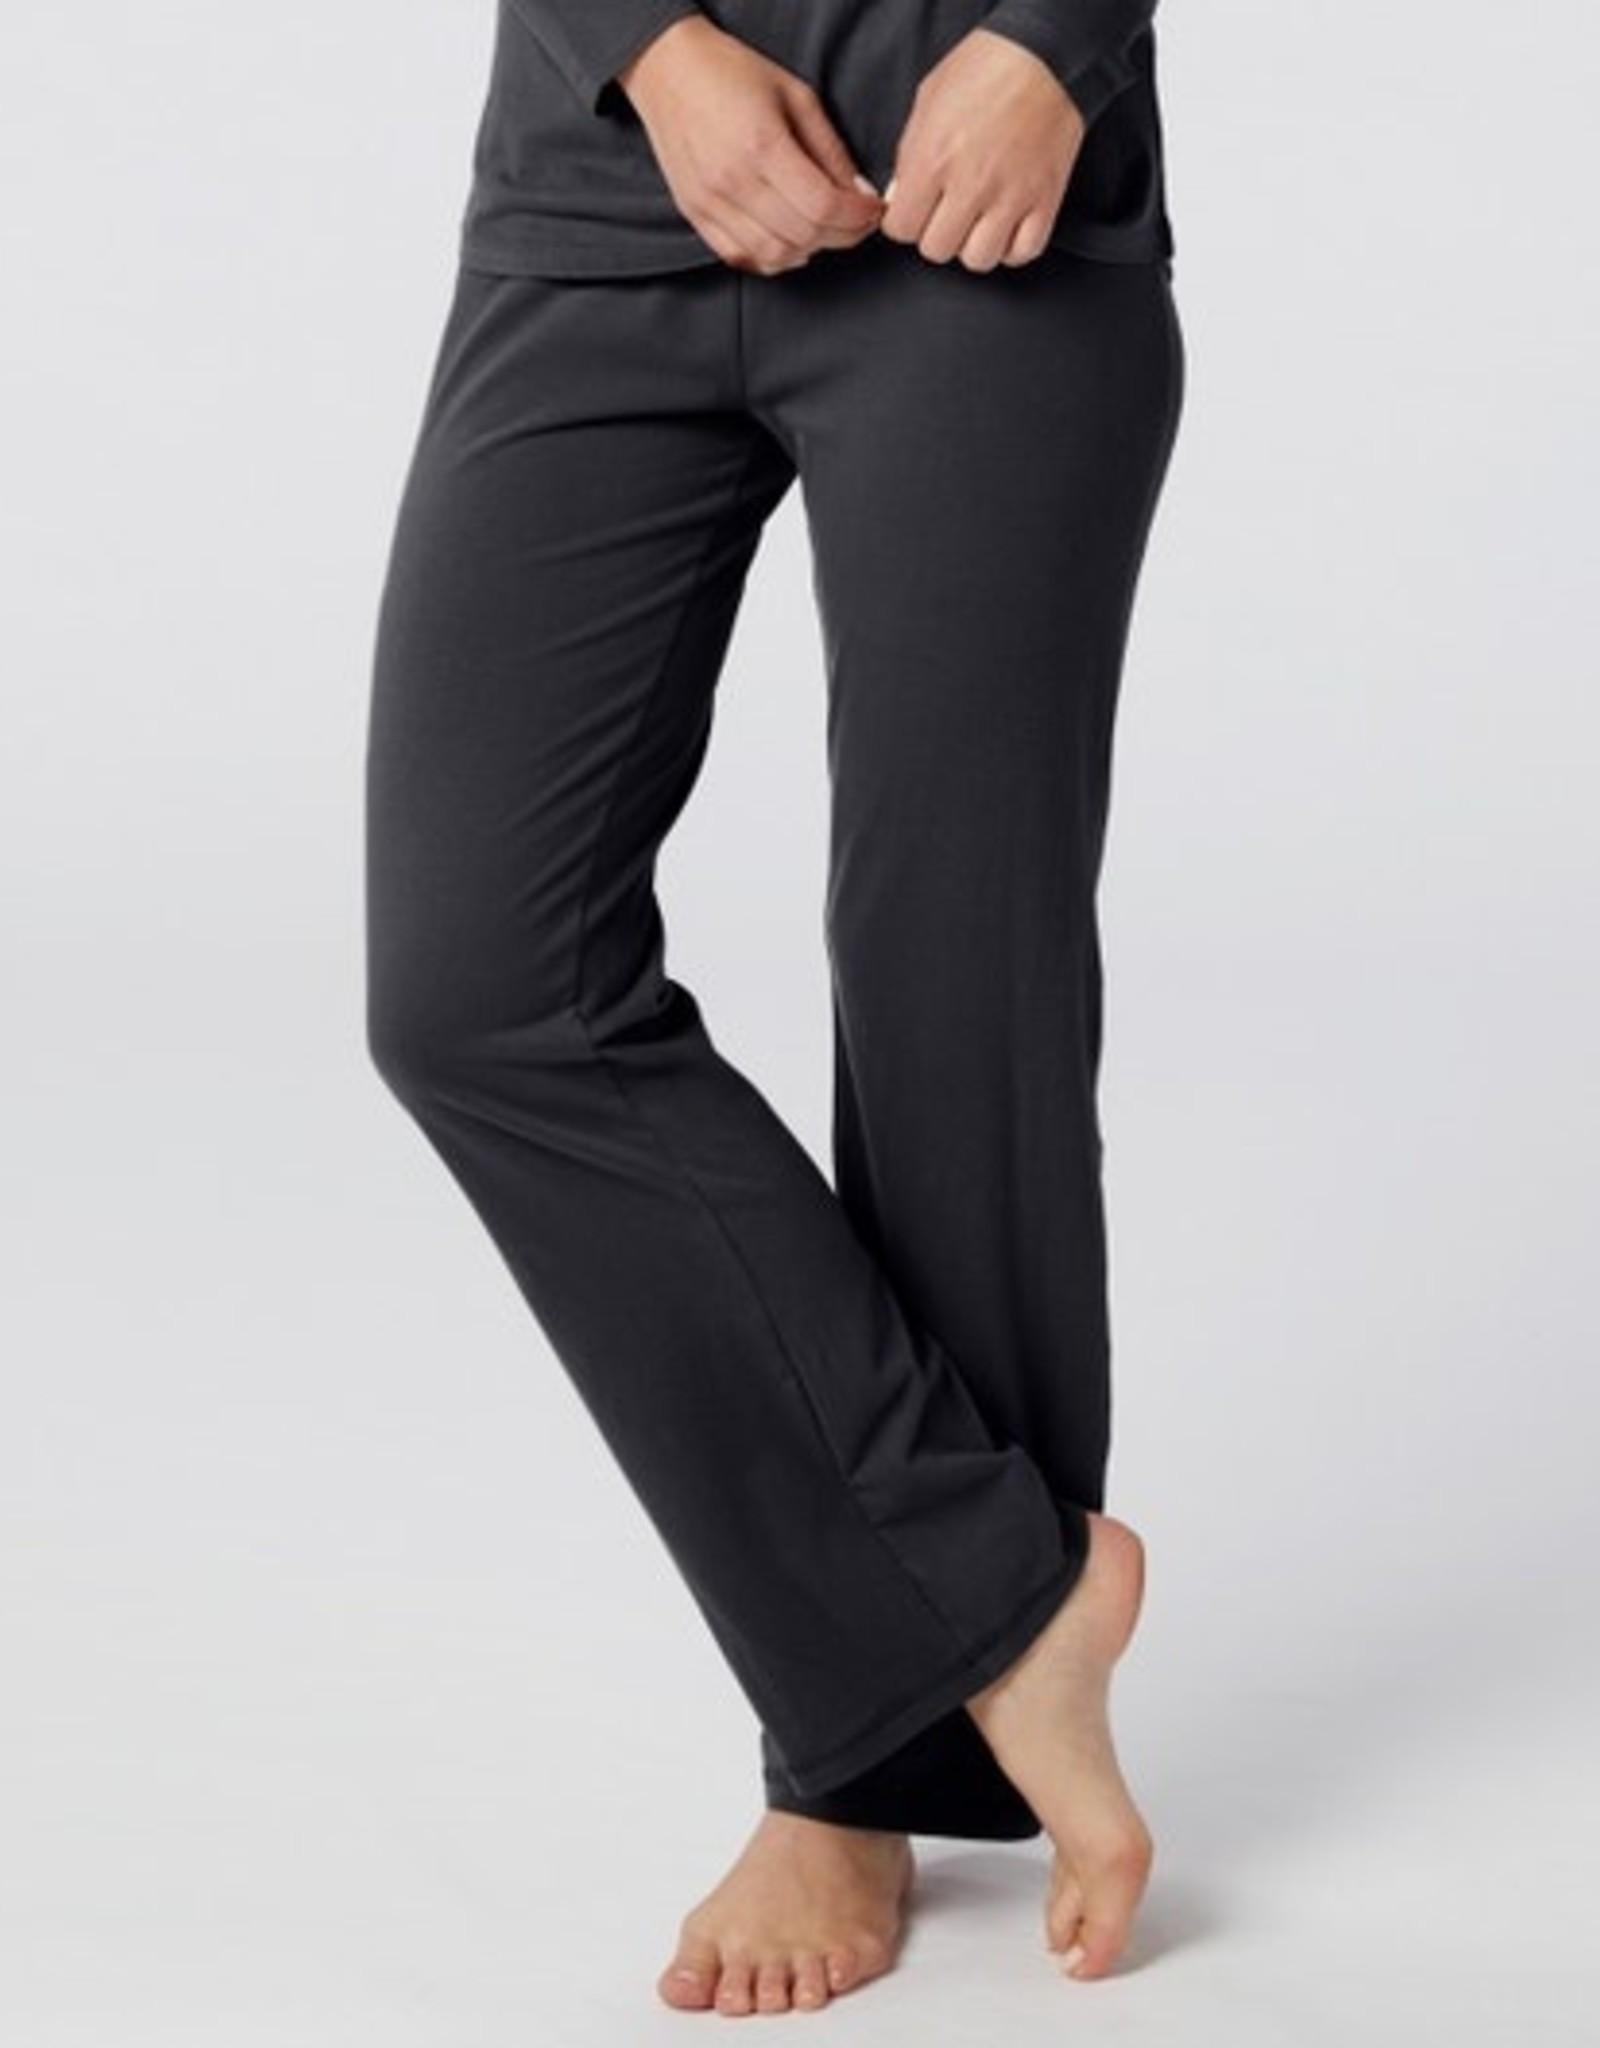 Women's Solstice Pajama Pants- Deep Graphite Small (4-6)